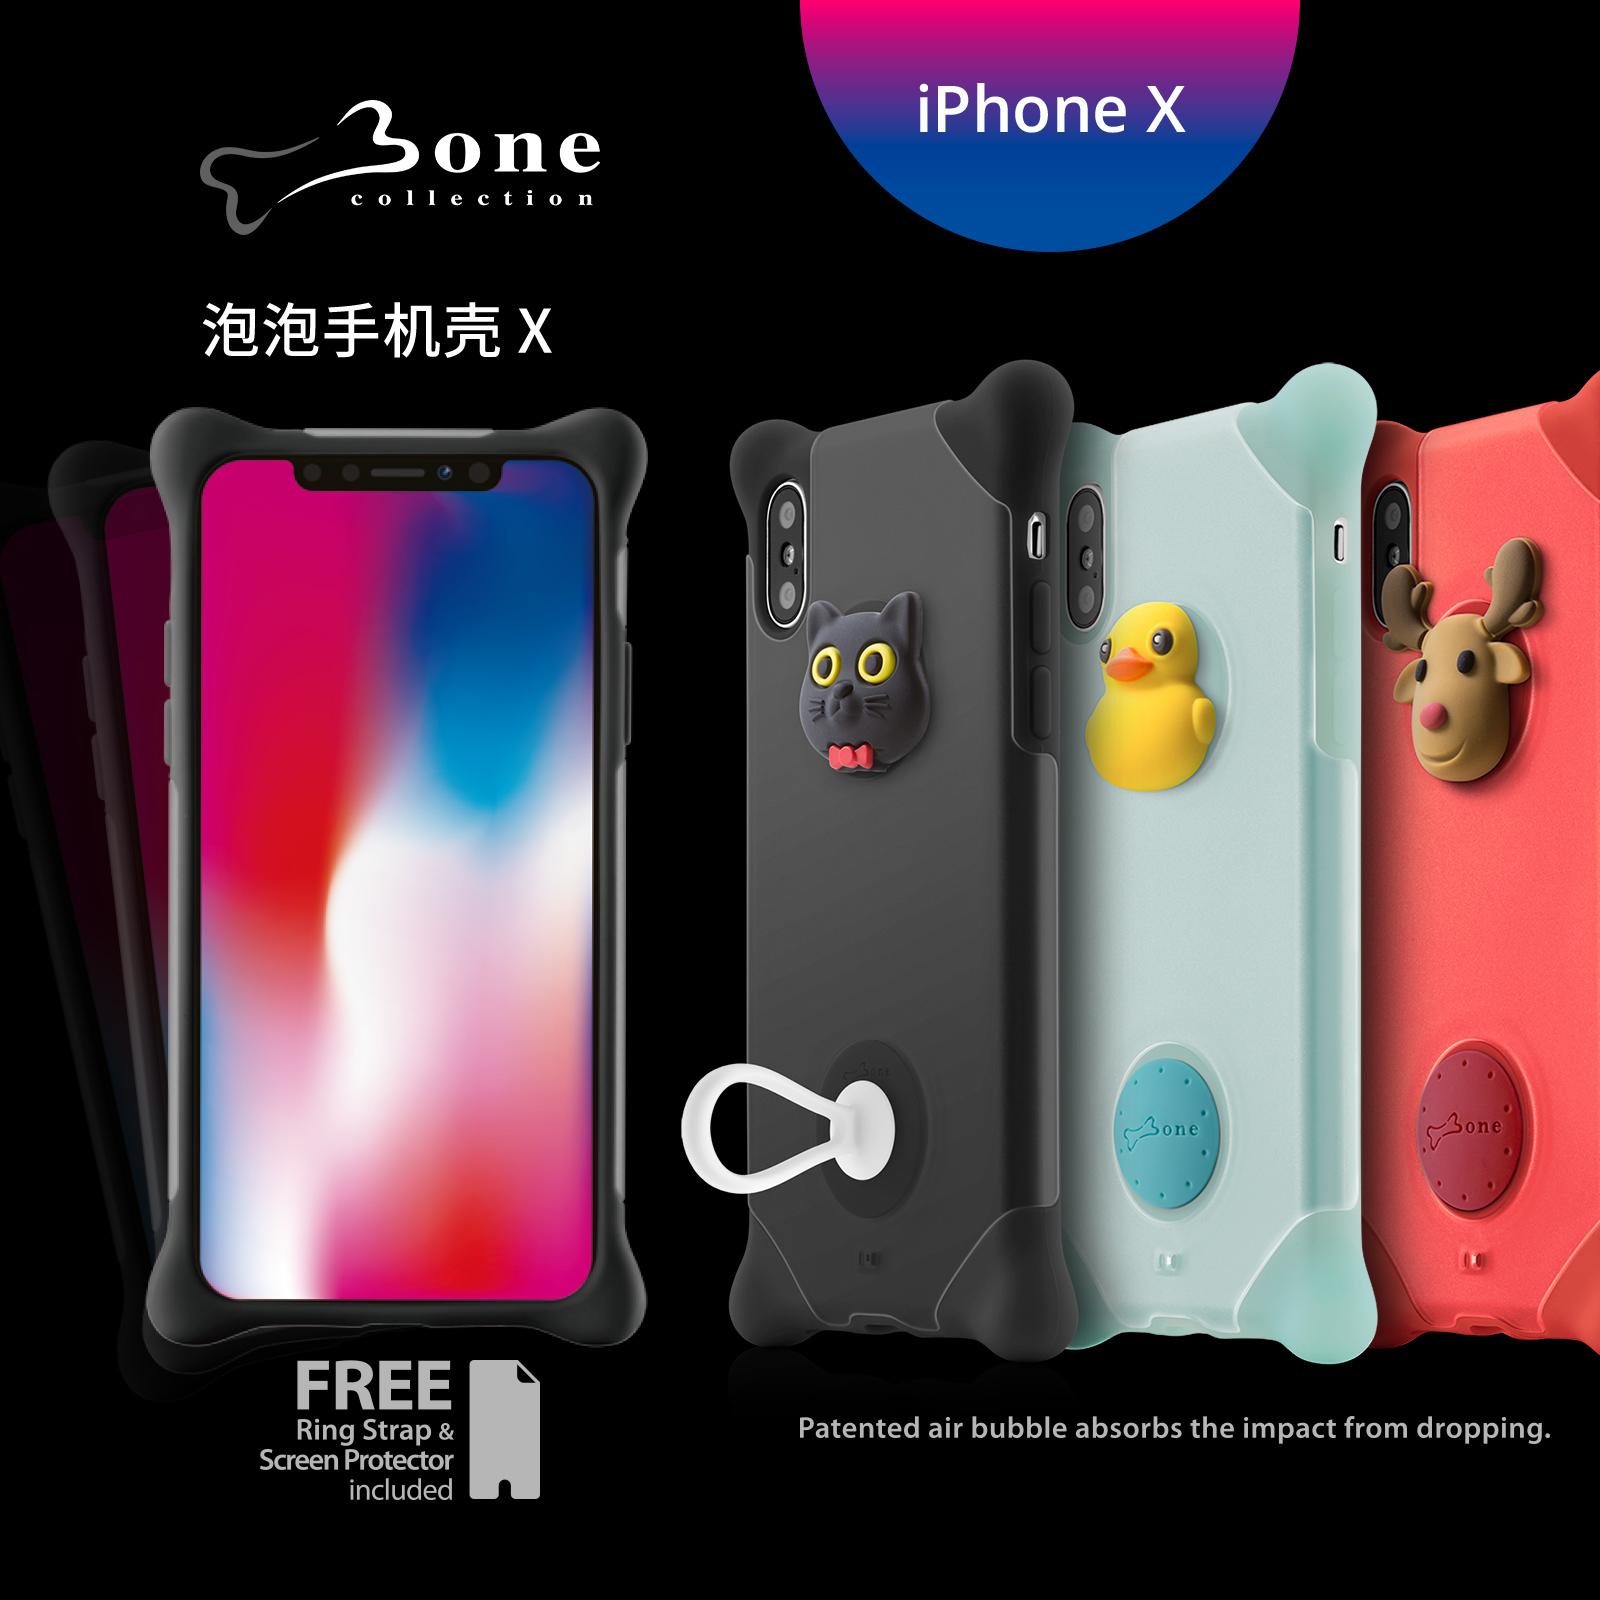 Bone 蹦克〡泡泡保护套iPhoneX手机壳可爱角色卡通防撞送指环扣